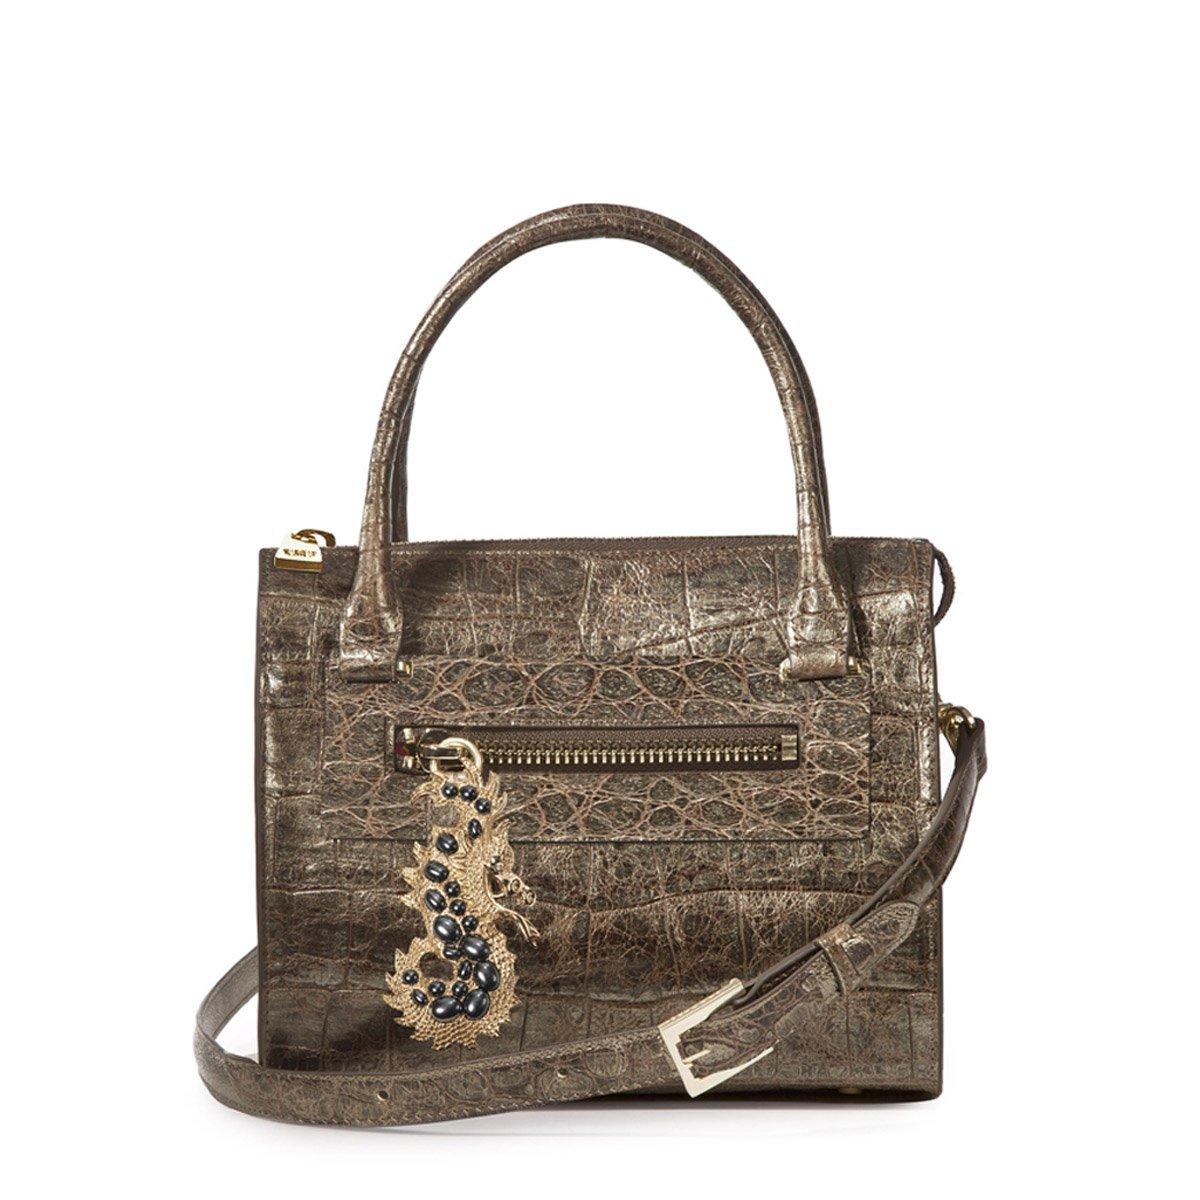 Eric Javits Luxury Fashion Designer Women's Handbag - Dragon Lady - Pewter